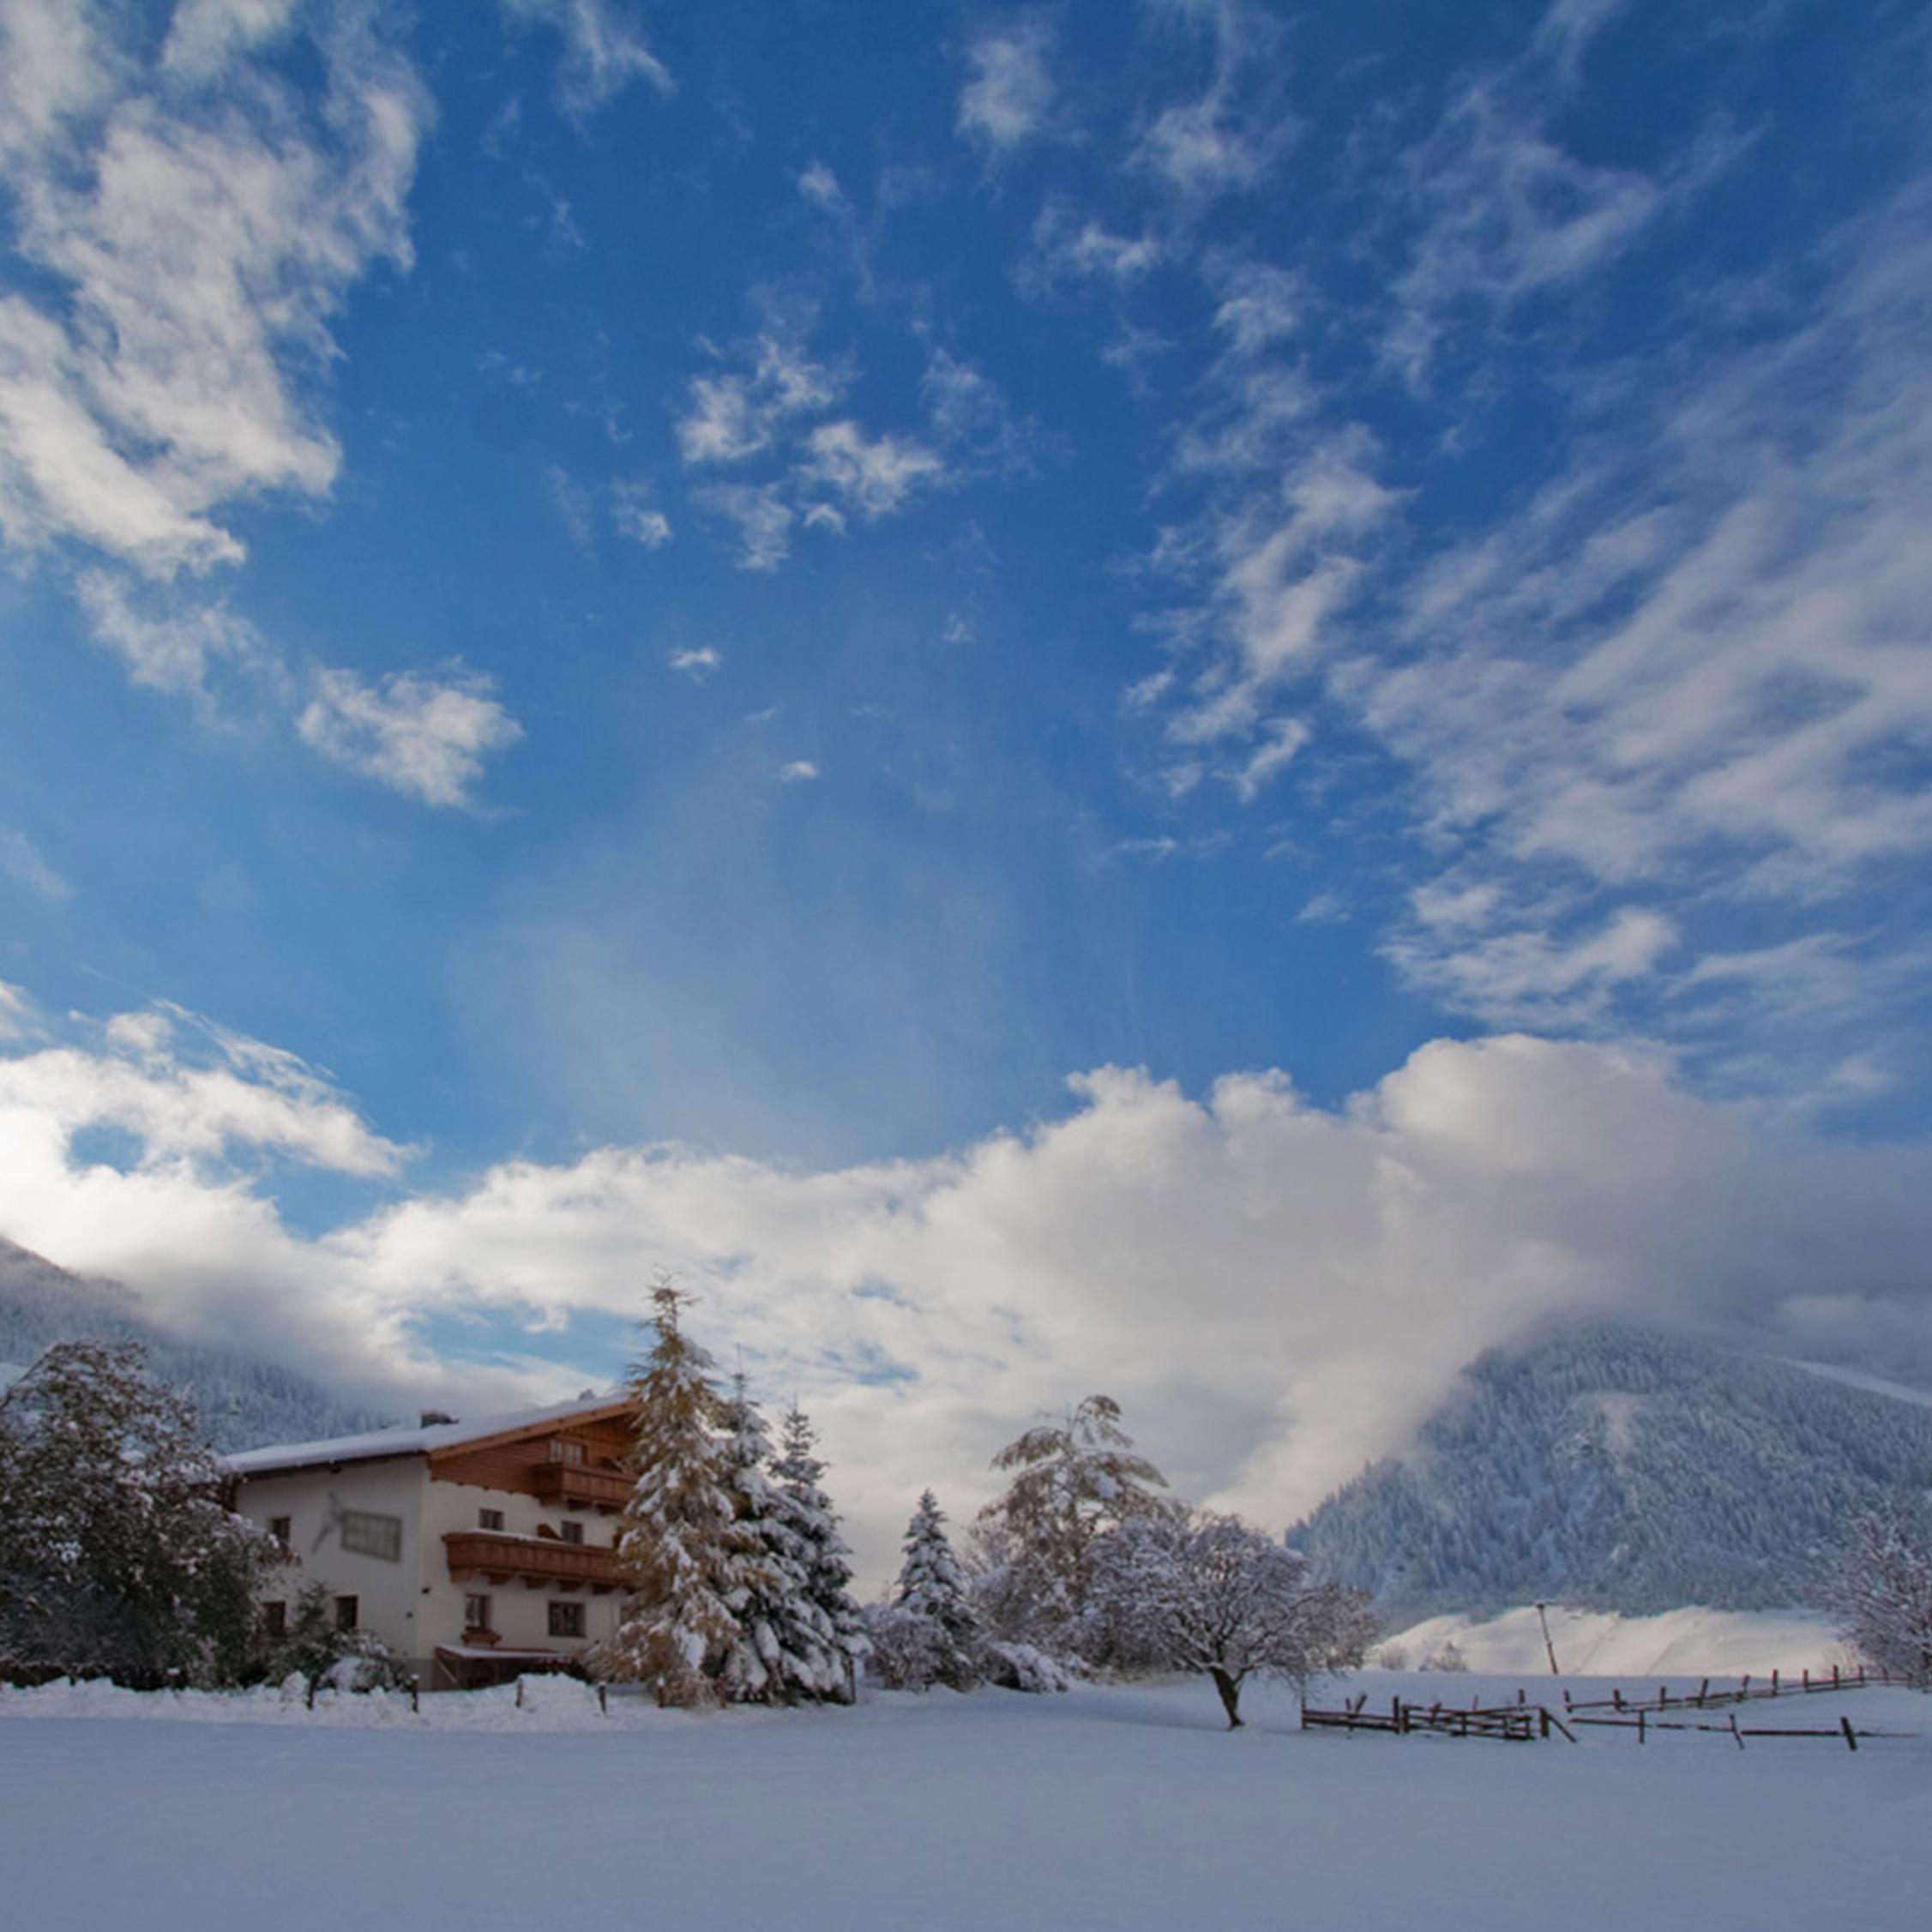 _Berghut met Proefhotellogo winter